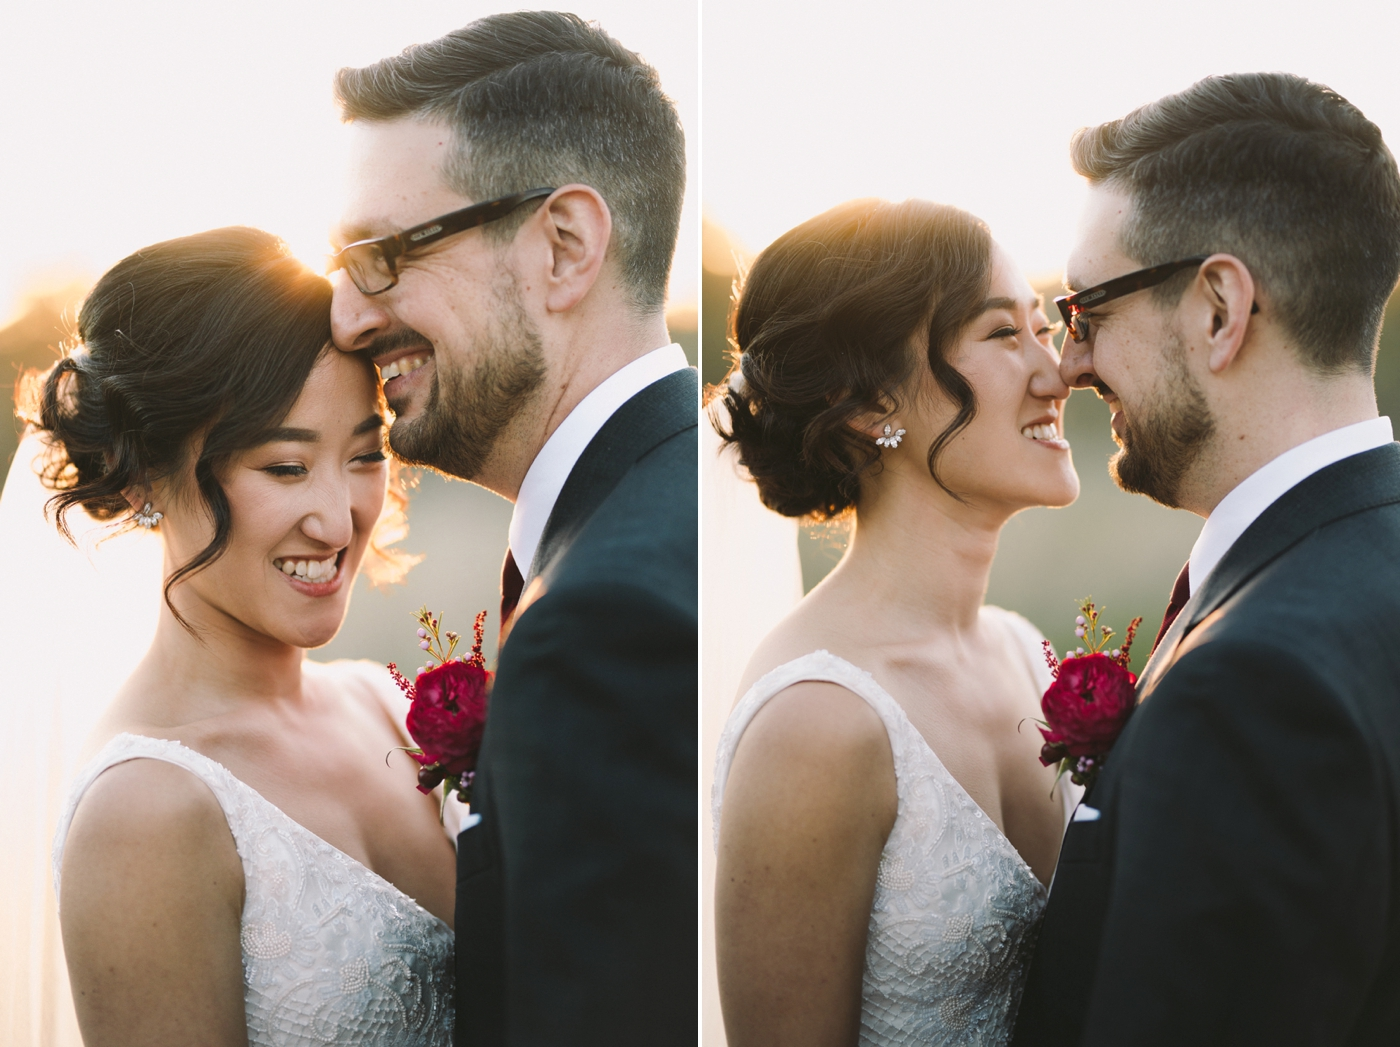 Adelaide Wedding Photographer - Al Ru Farm Wedding in Adelaide - Natural Wedding Photography Australia - www.katherineschultzphotography.com - Todd & Rachel_0055.jpg